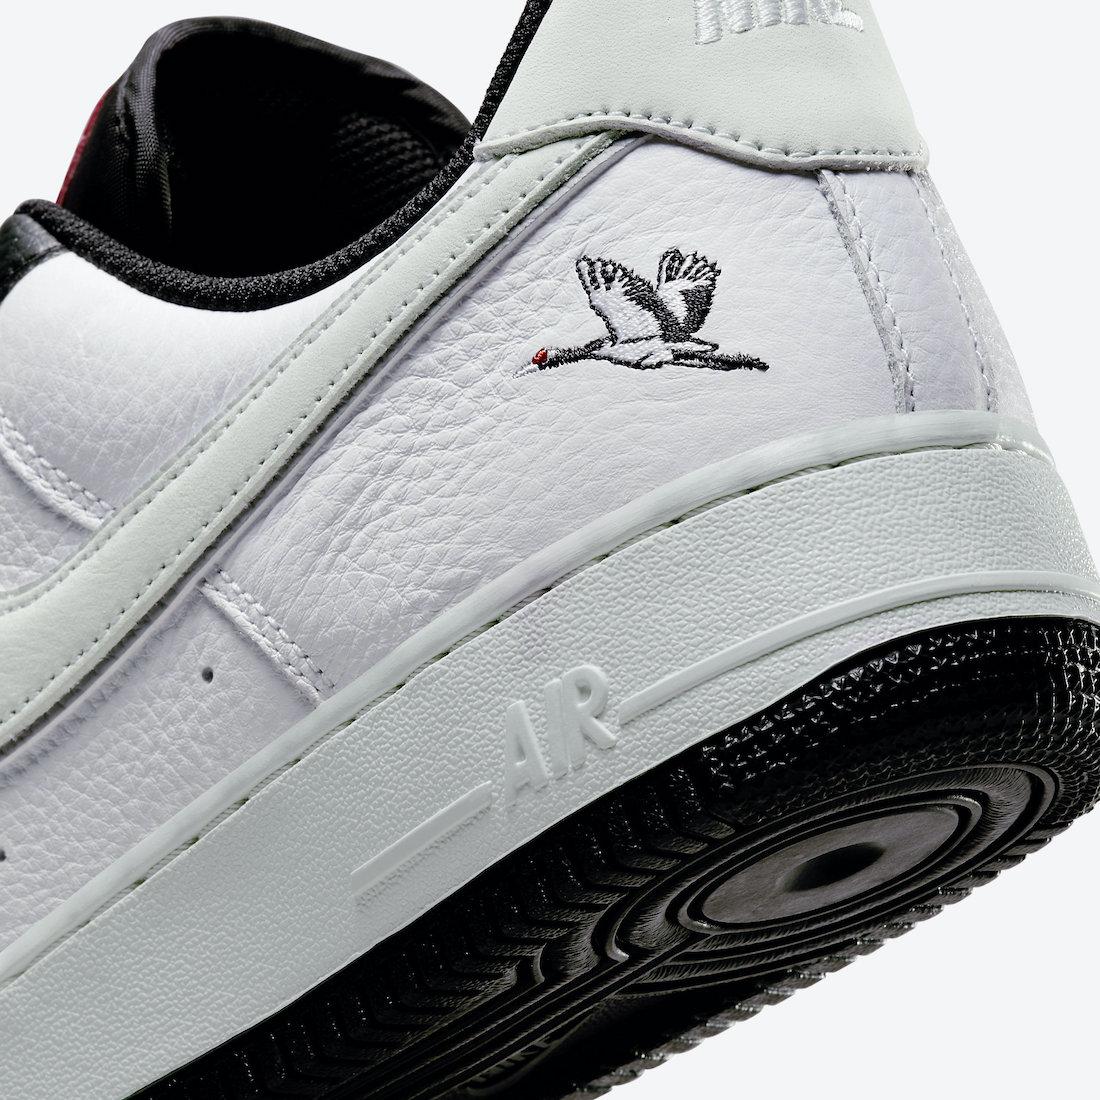 Nike-Air-Force-1-Low-Milky-Stork-DA8482-100-Release-Date-6